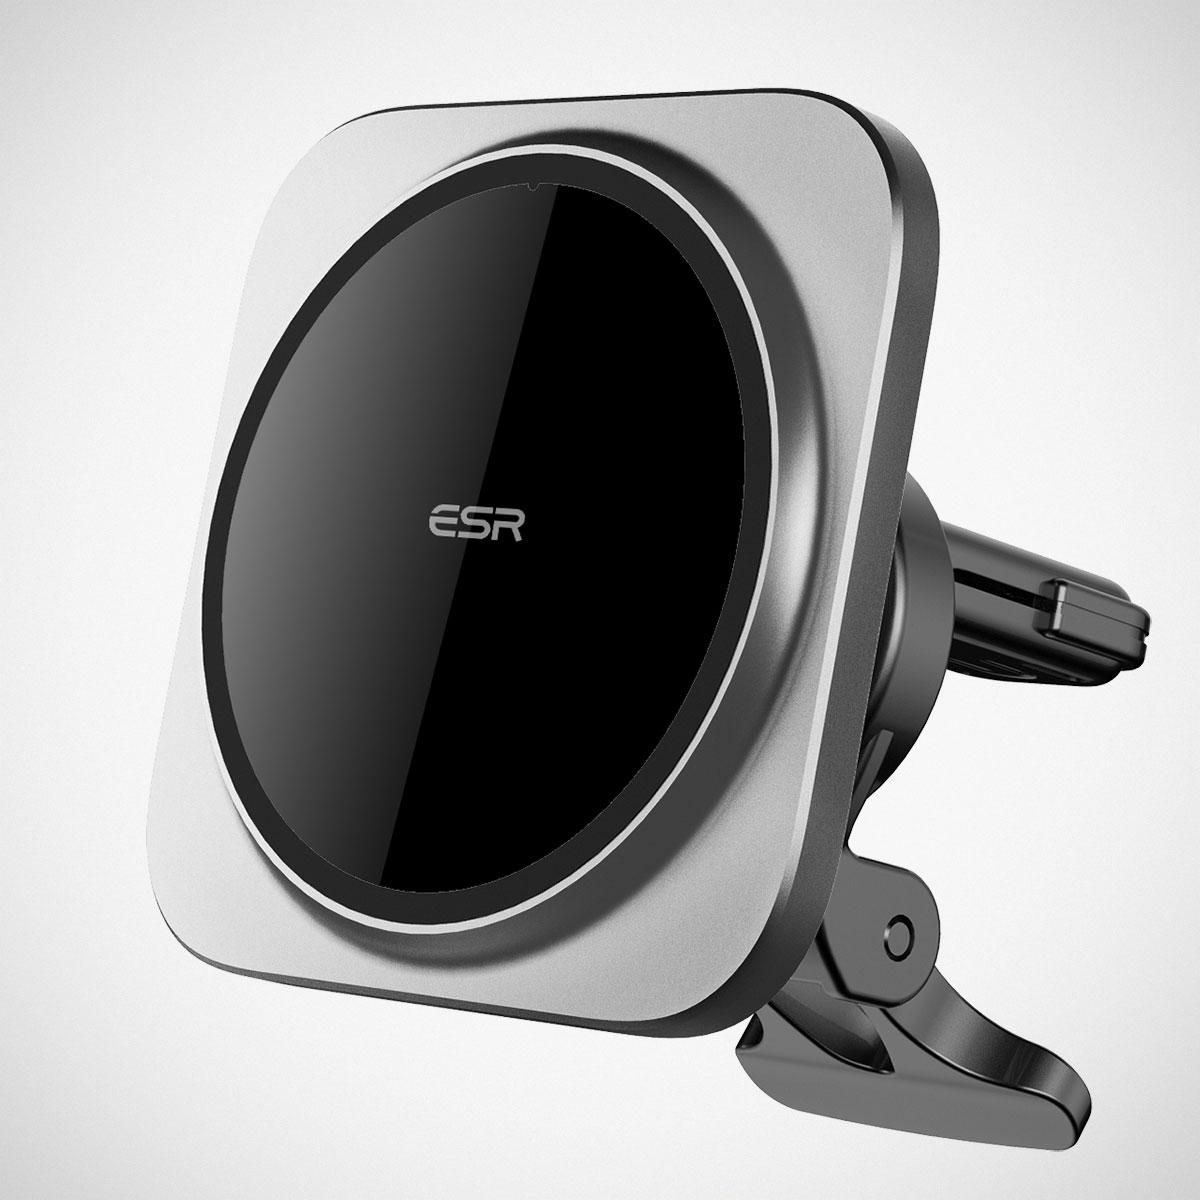 ESR HaloLock MagSafe-compatible Magnetic Car Charger